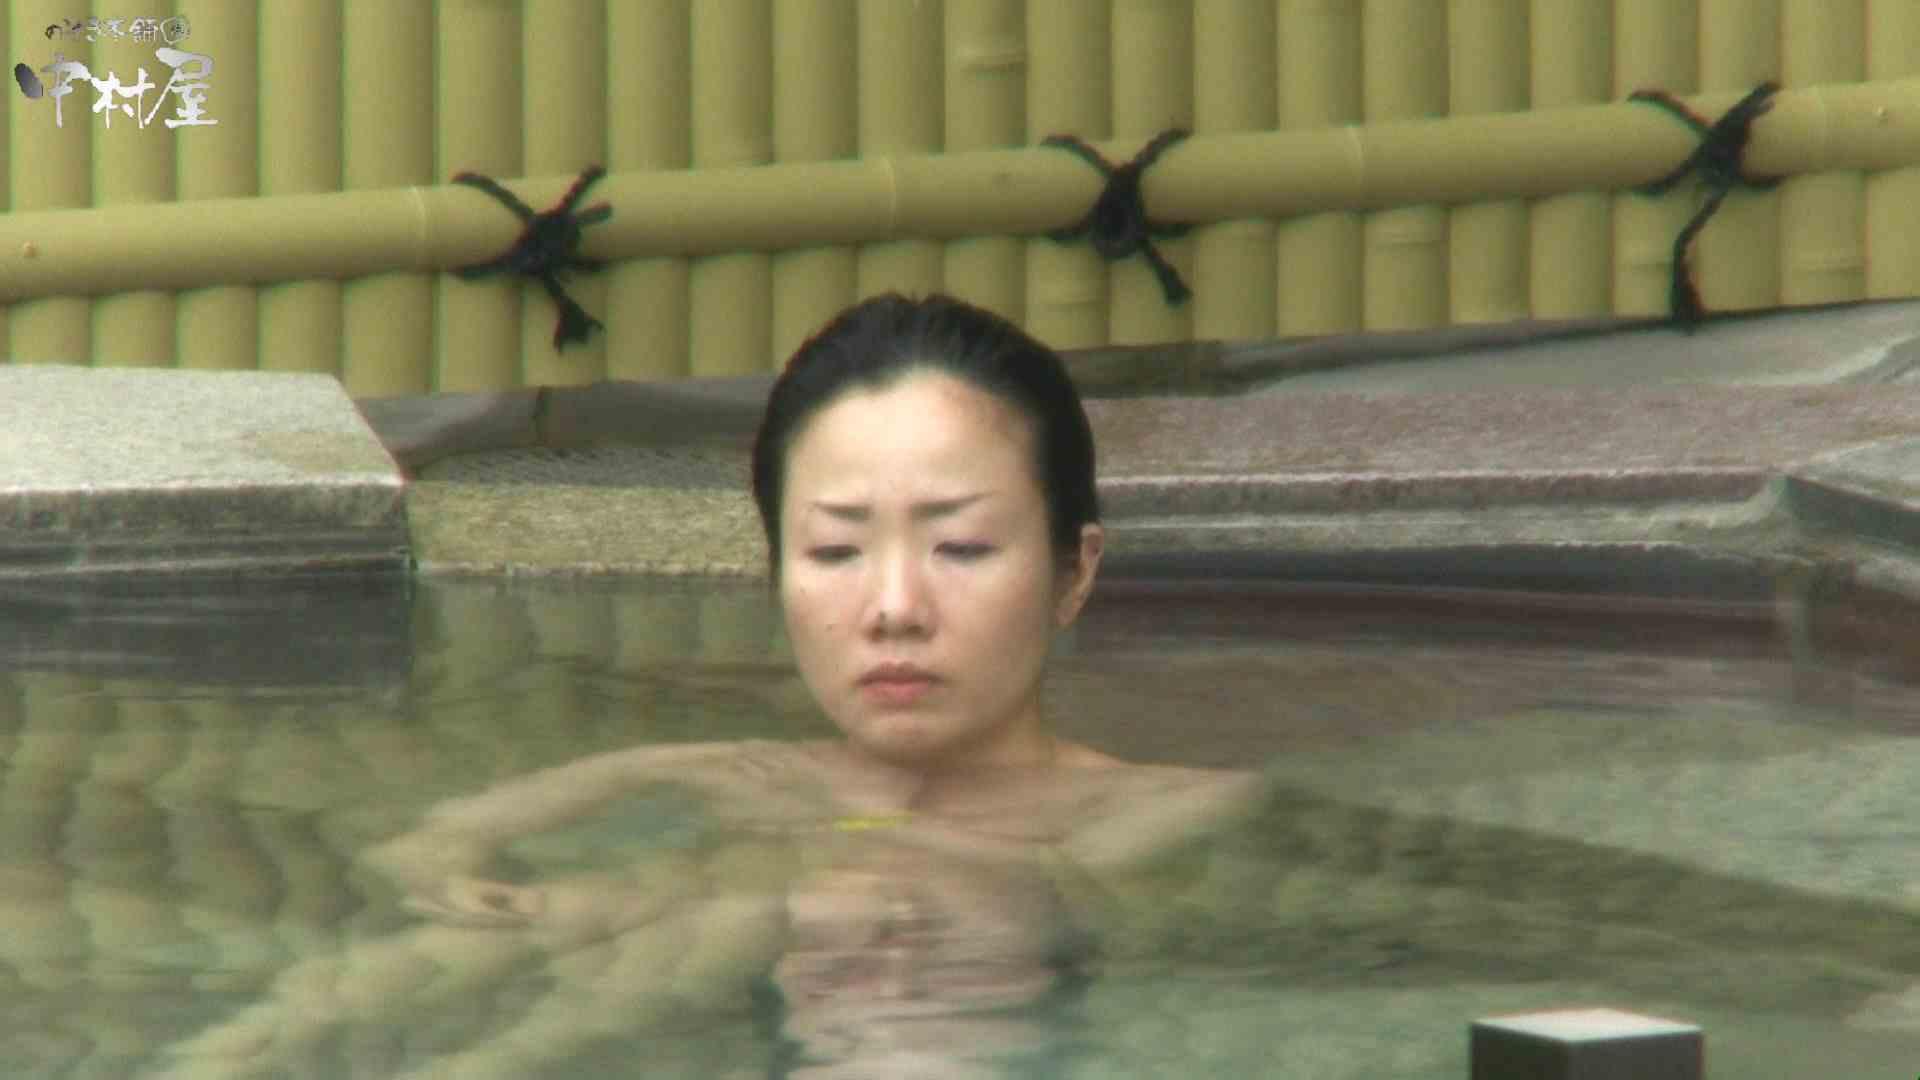 Aquaな露天風呂Vol.950 盗撮師作品 おまんこ動画流出 75pic 32